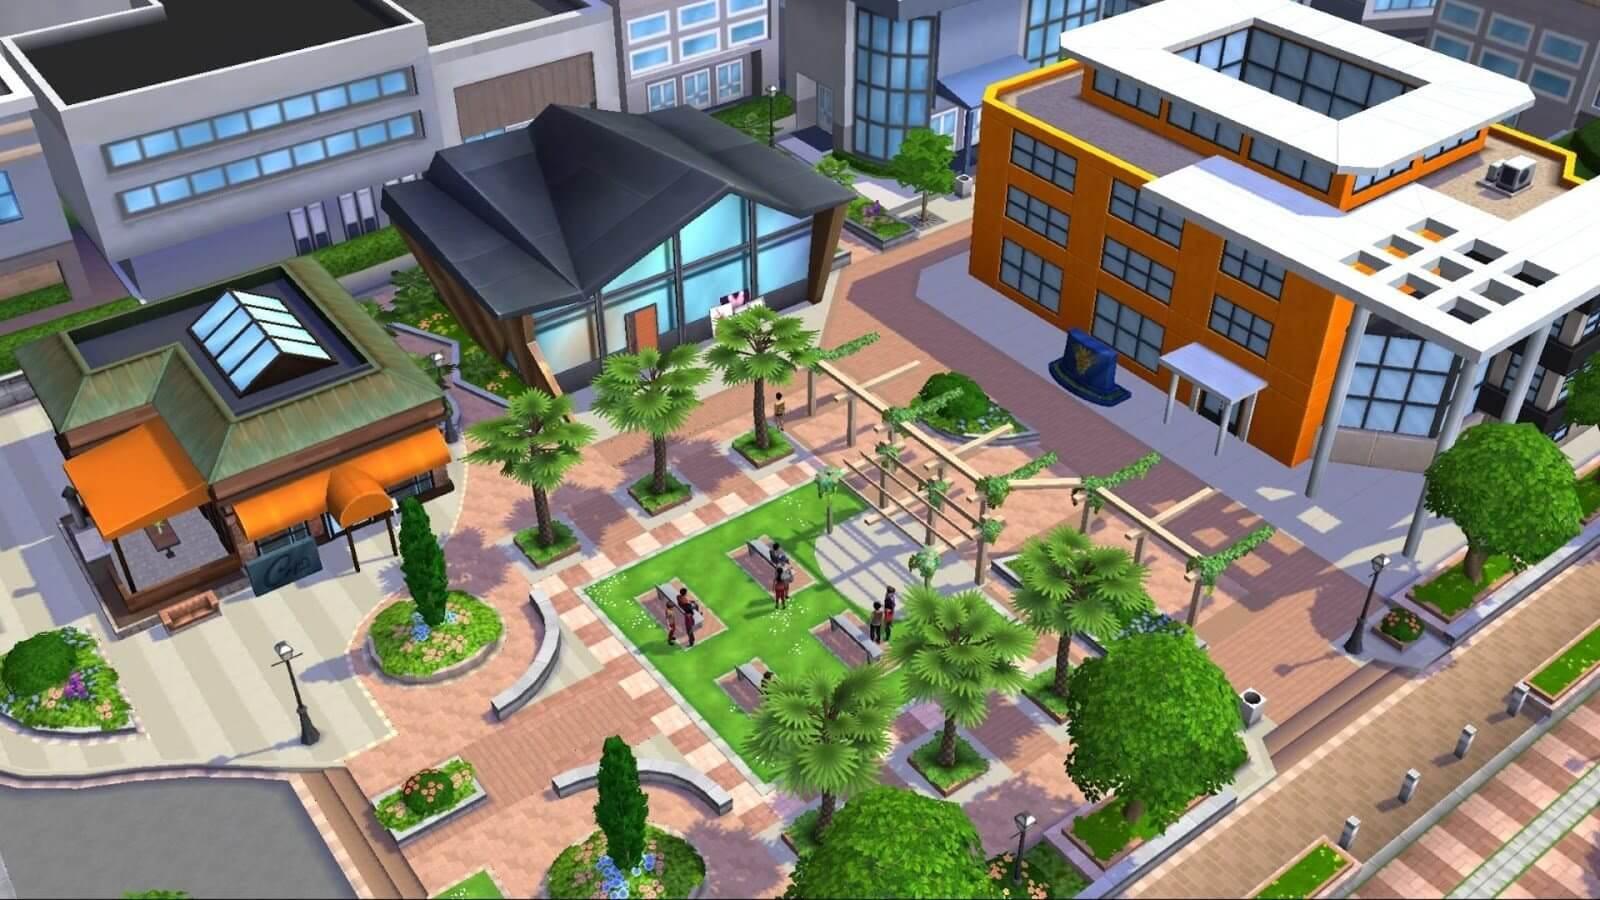 unnamed - Mate a saudade! Novo The Sims chega para Android e iOS